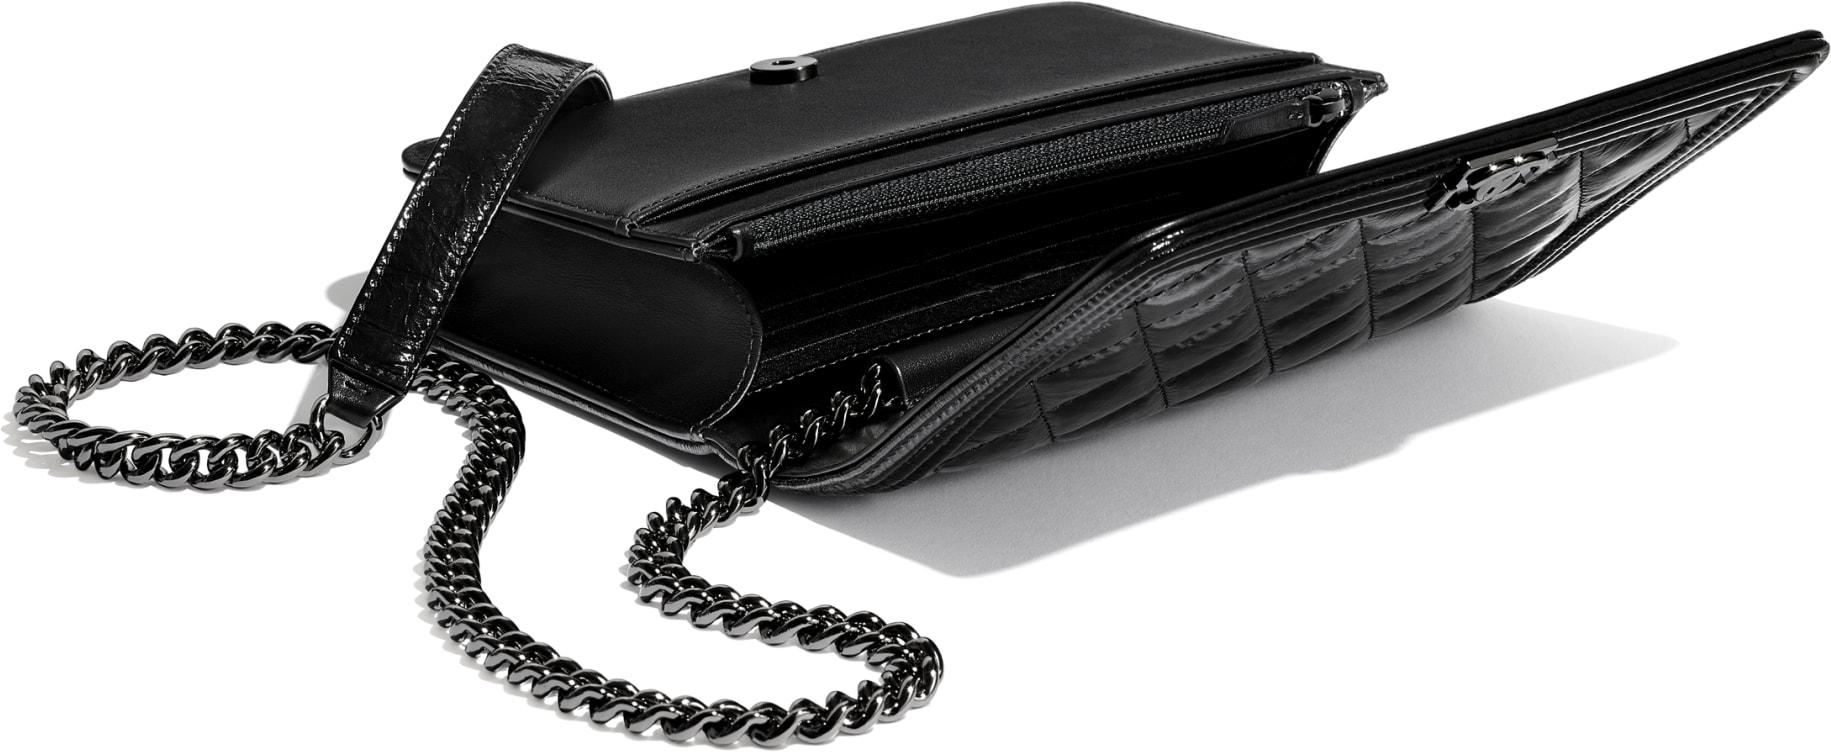 Wallet on chain BOY CHANEL